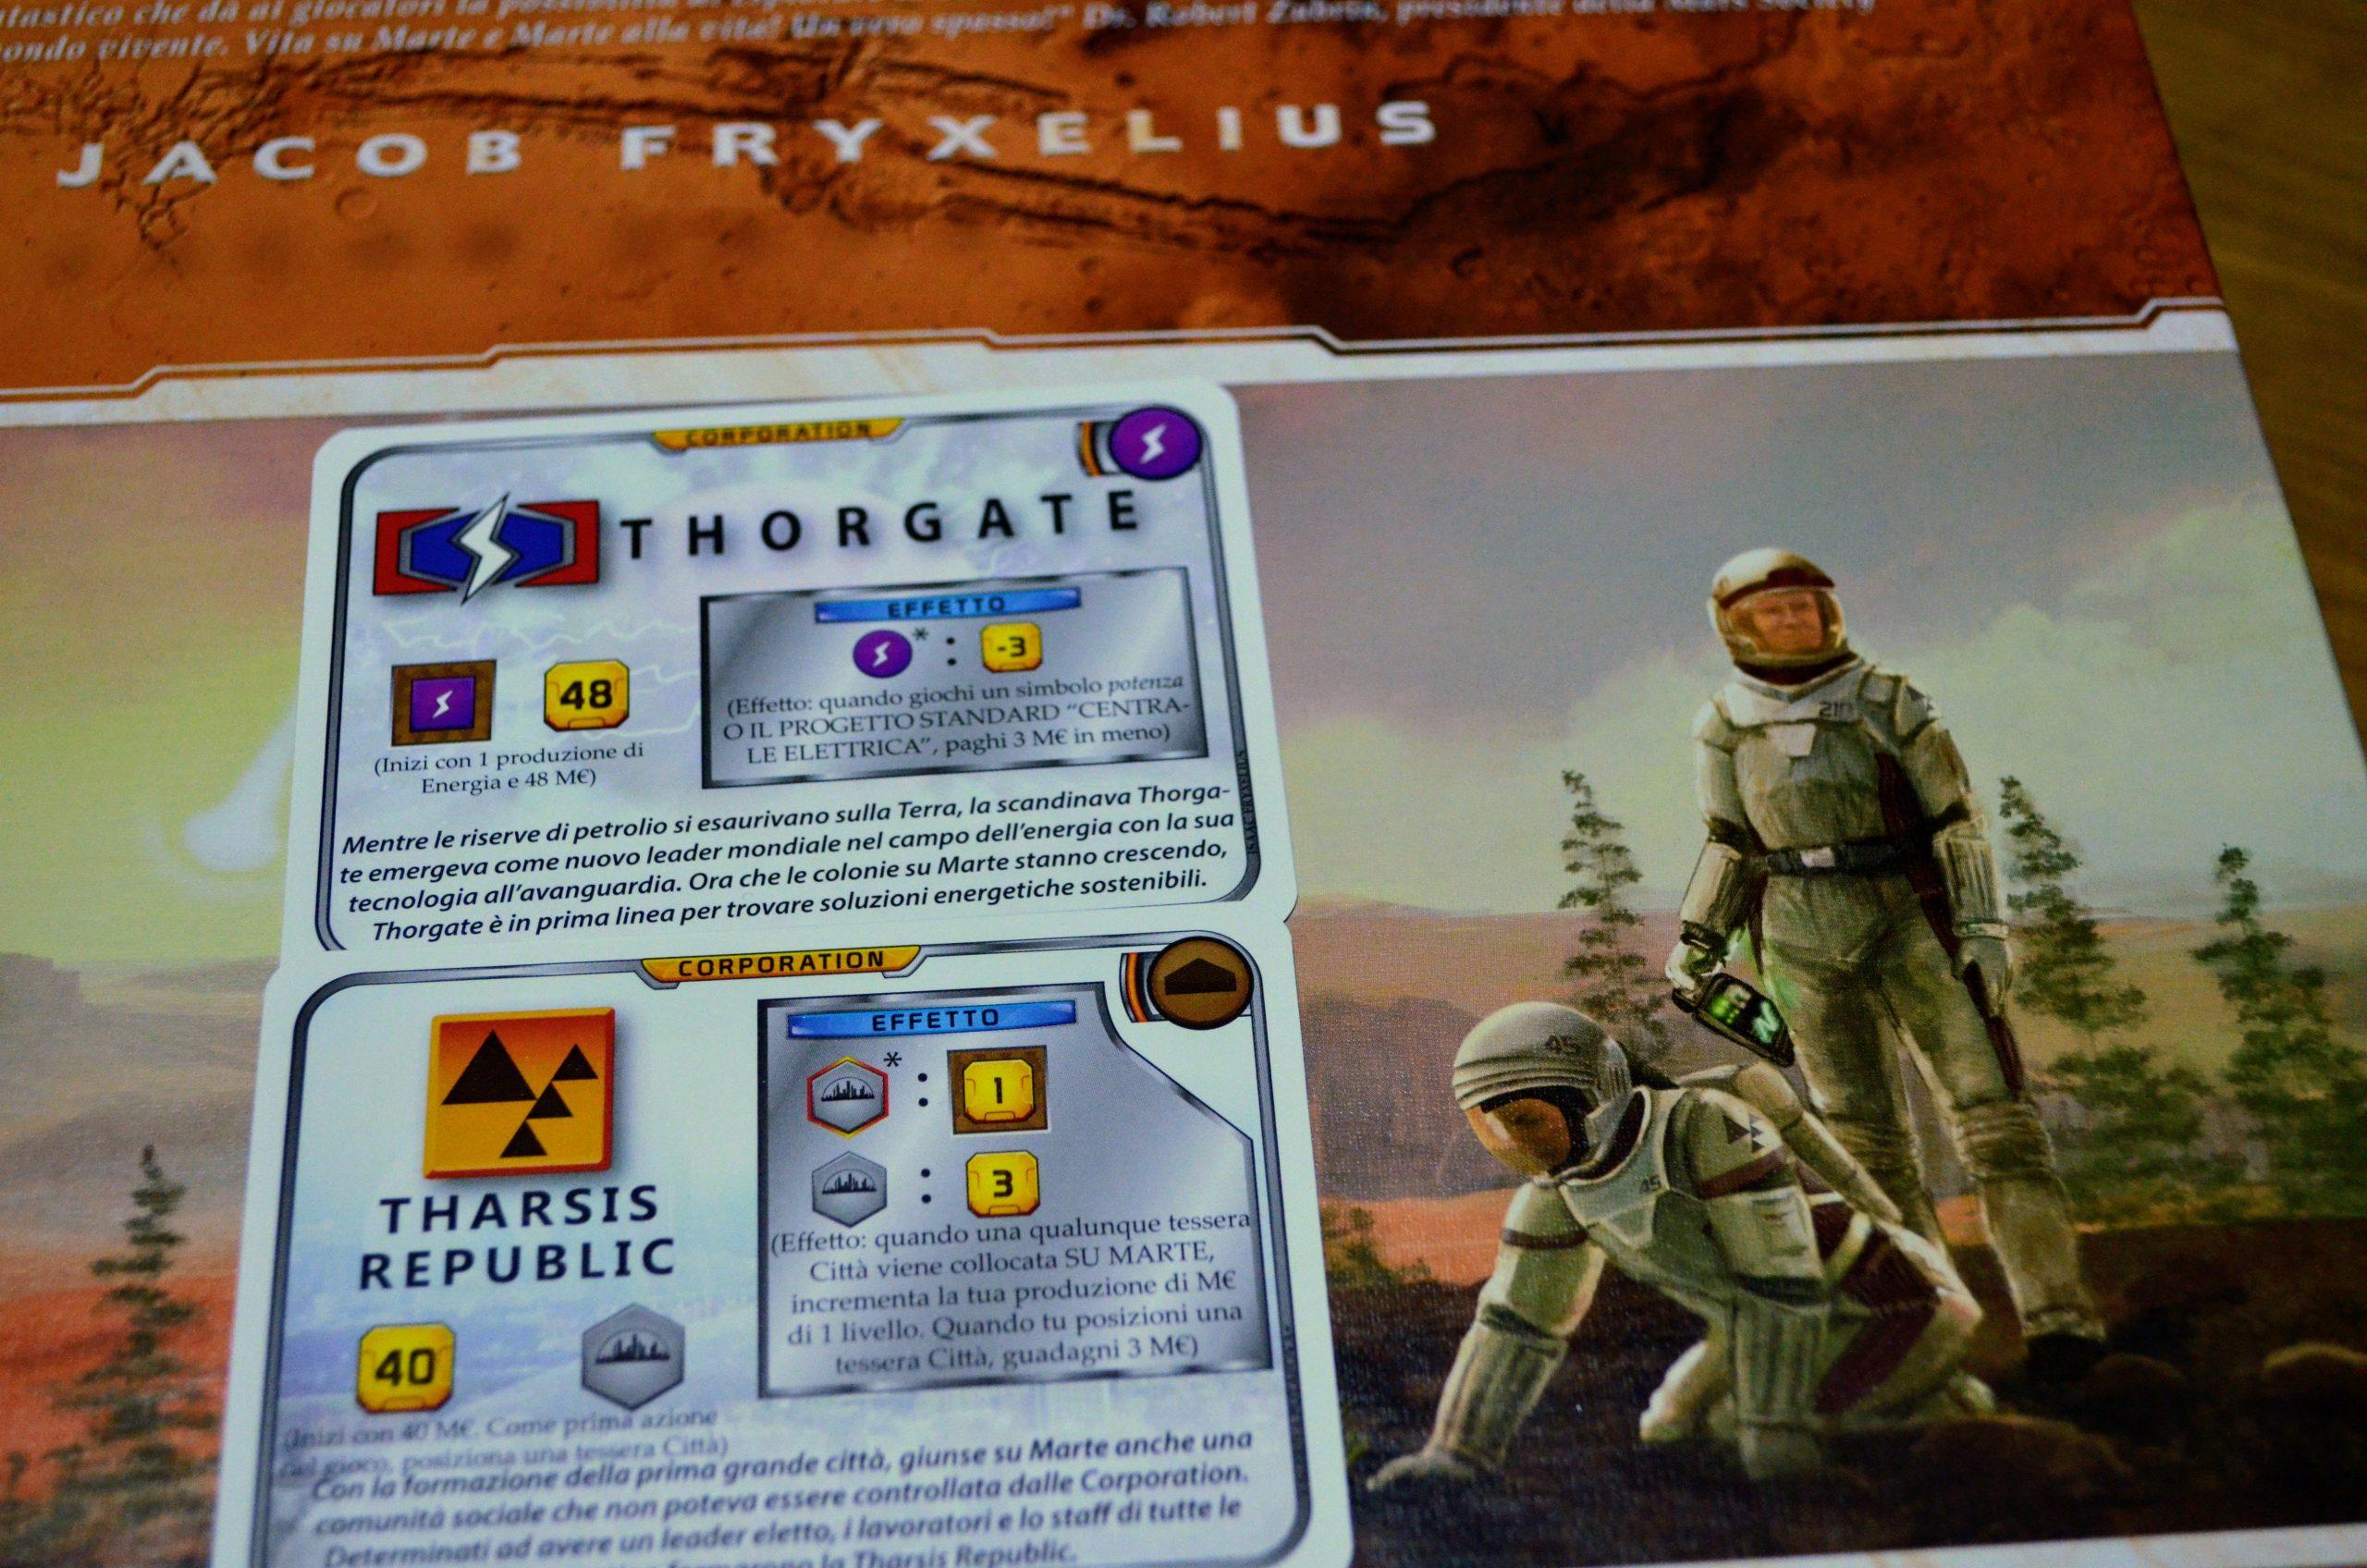 Terraforming Mars Corporations